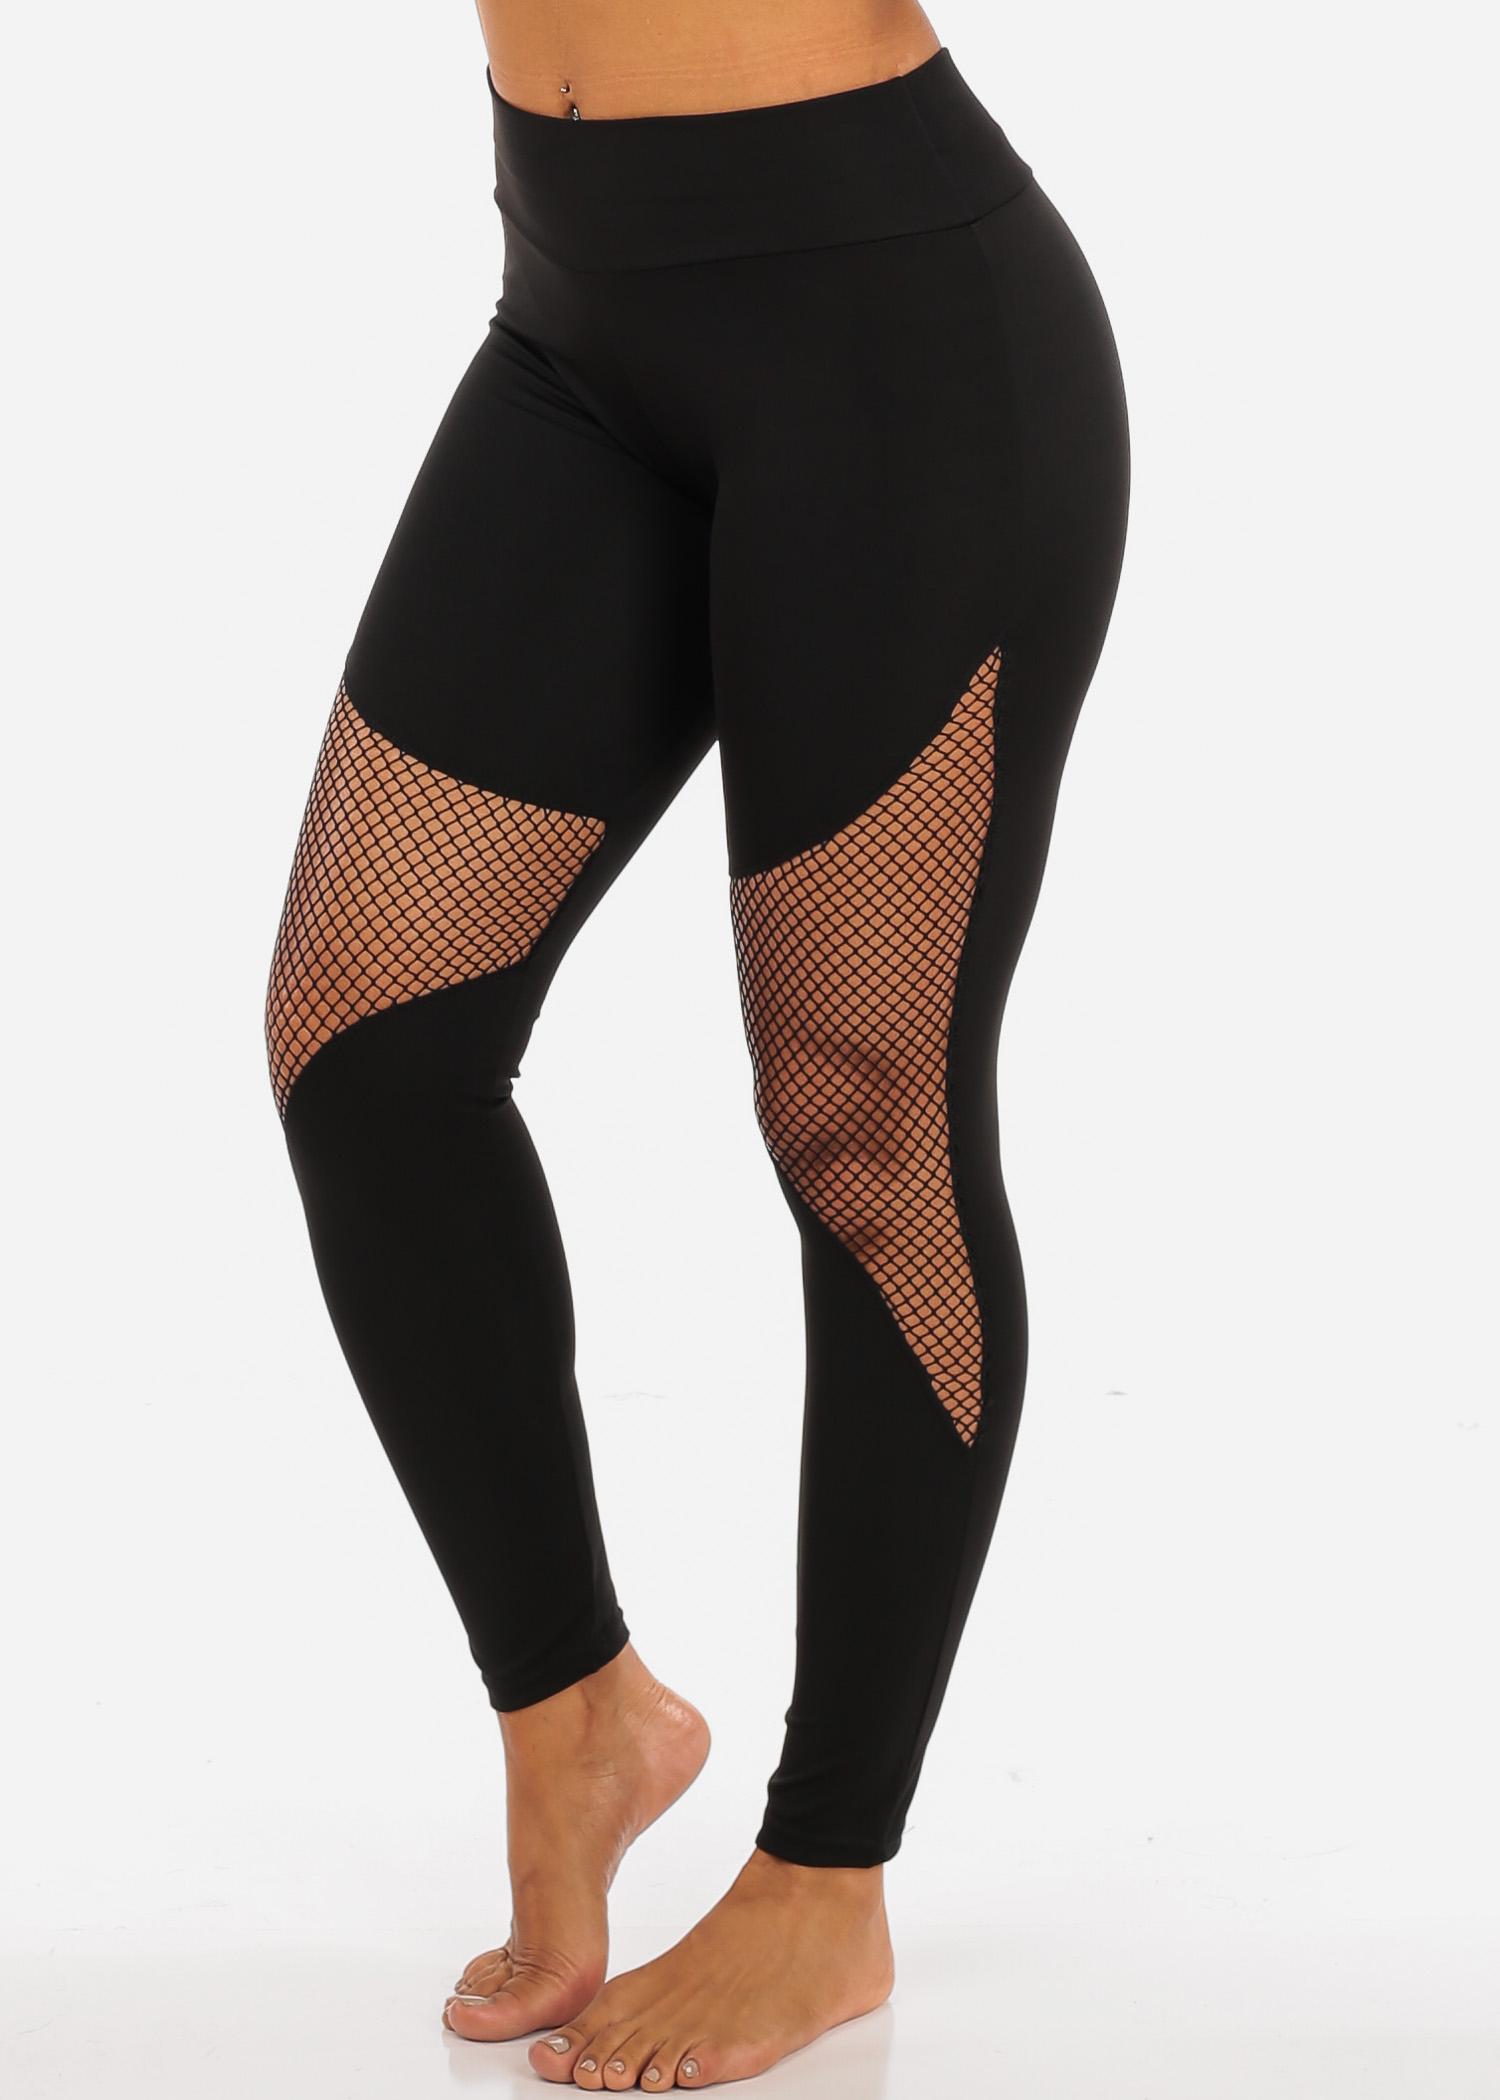 Womens Juniors Activewear Black Fishnet Detail High Waisted Leggings 41505P